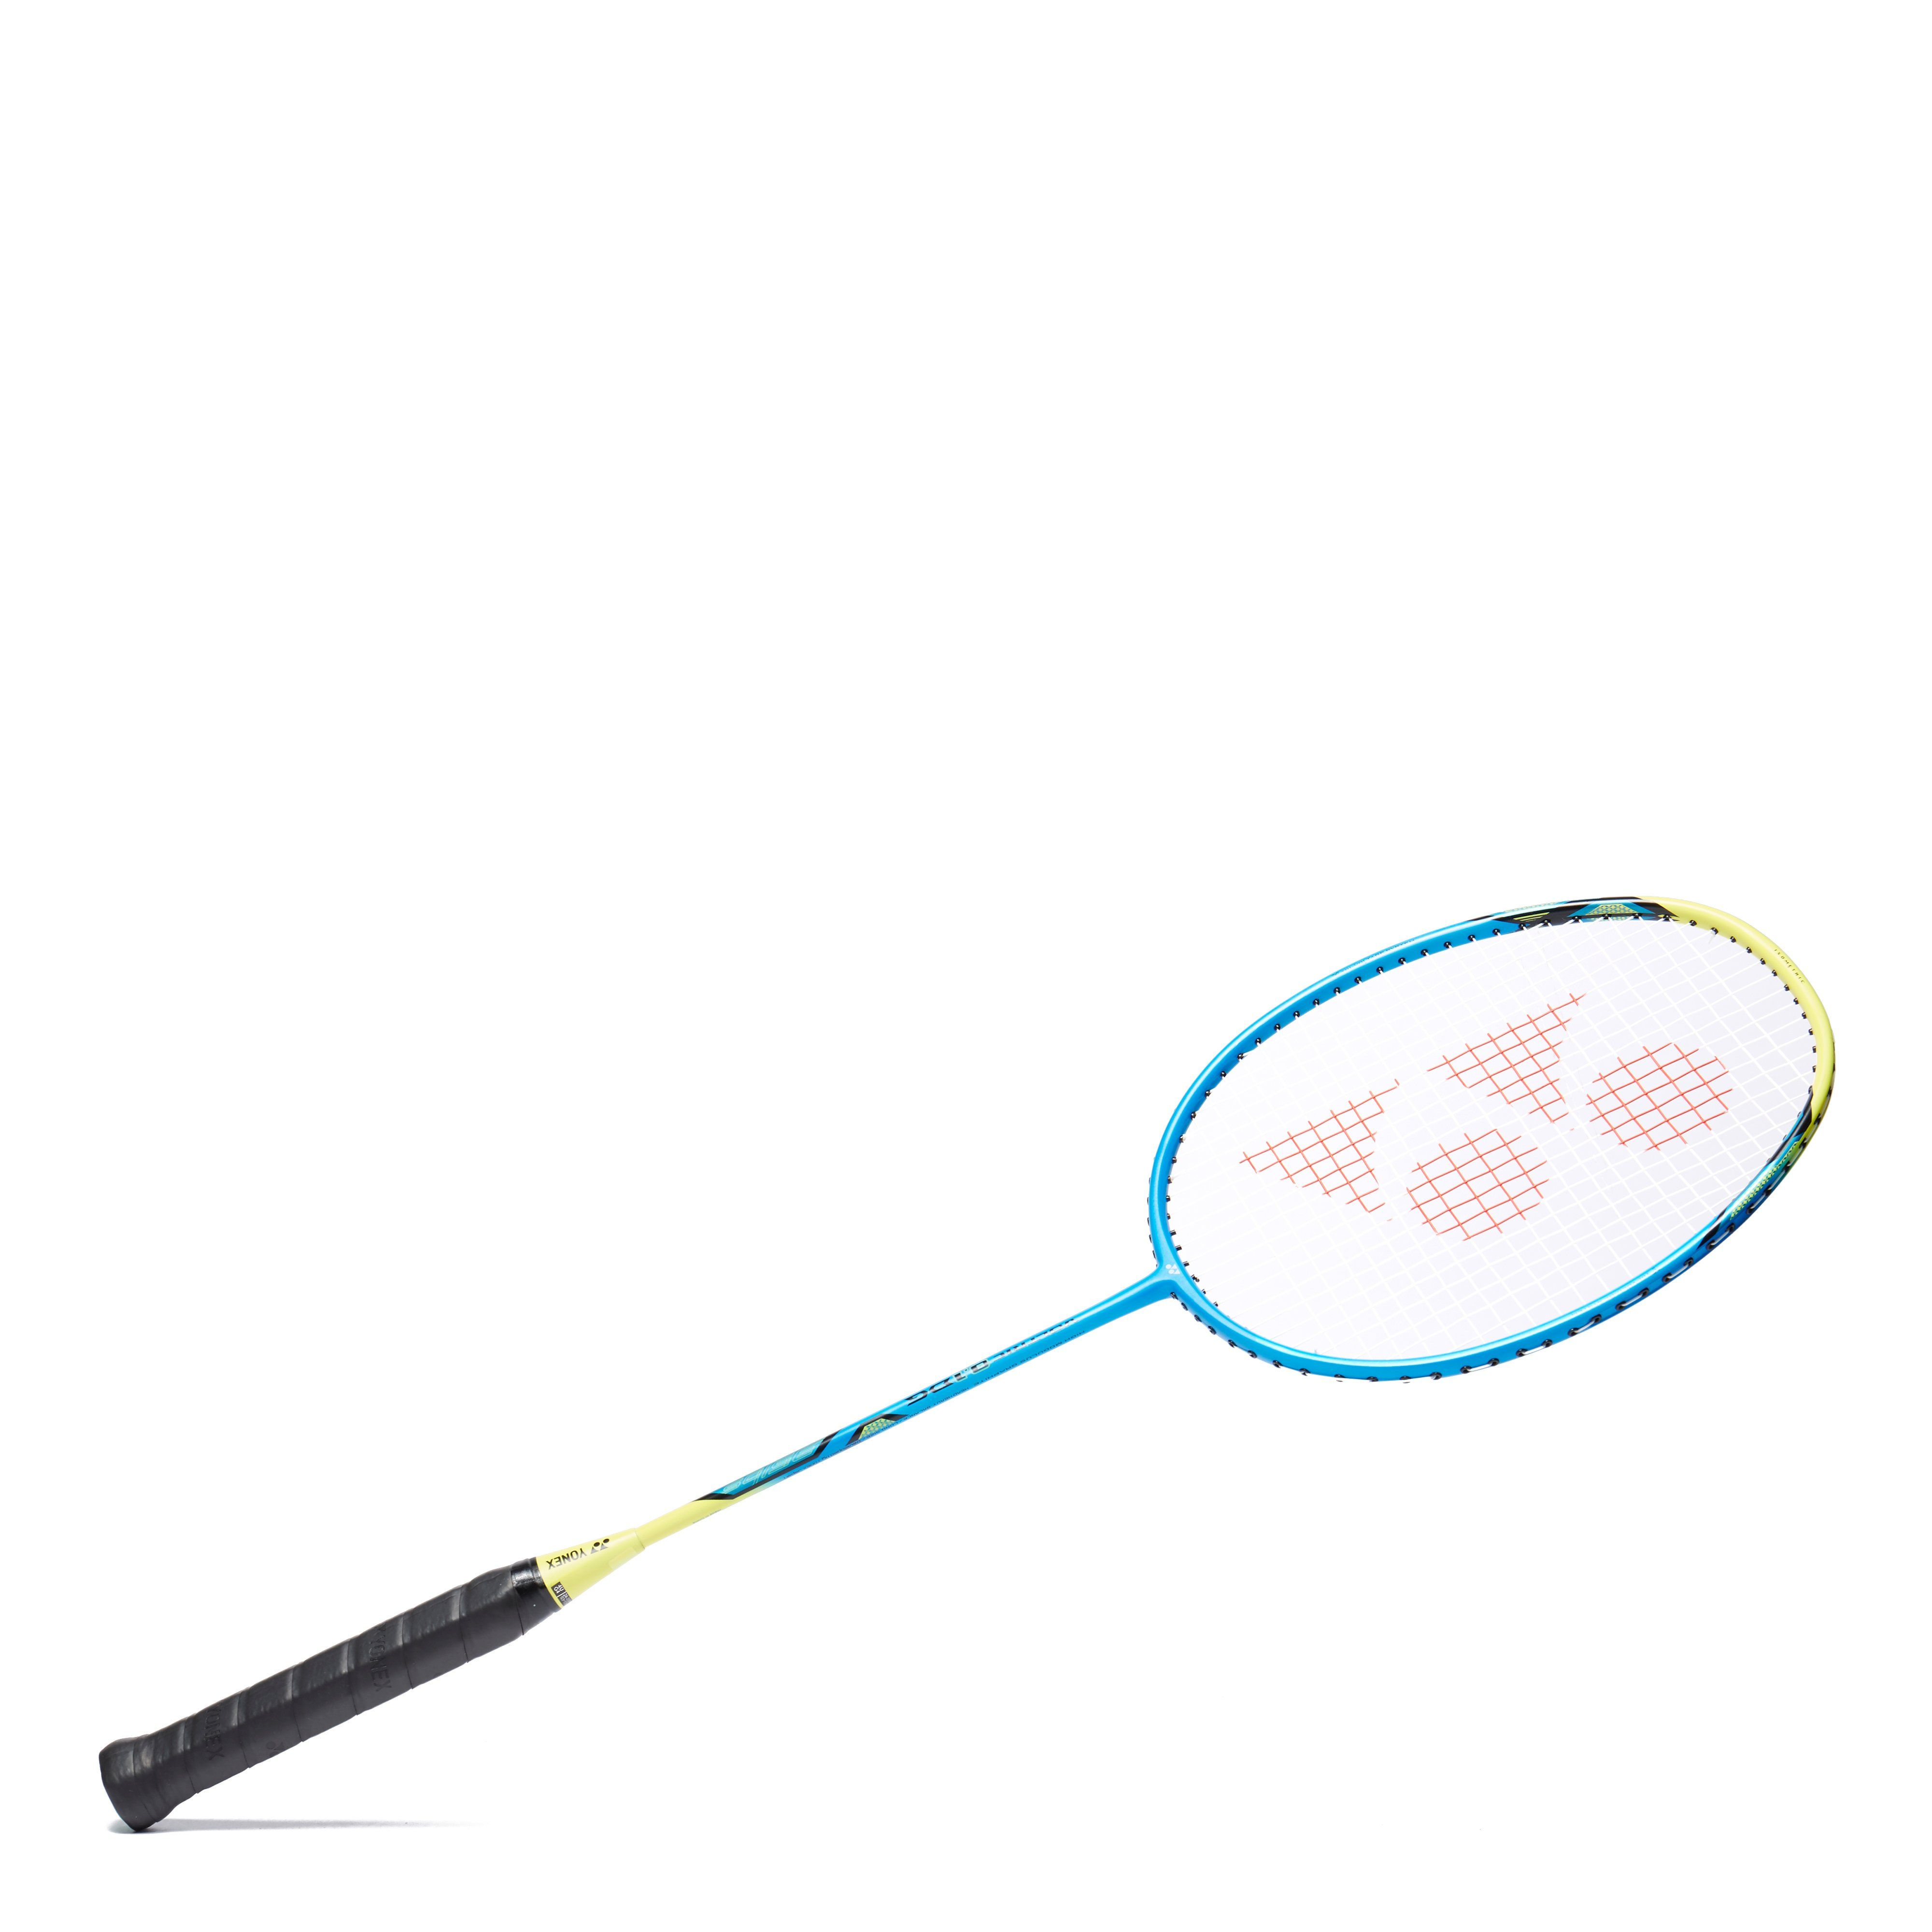 Yonex Voltric 0.1DG Badminton Racket